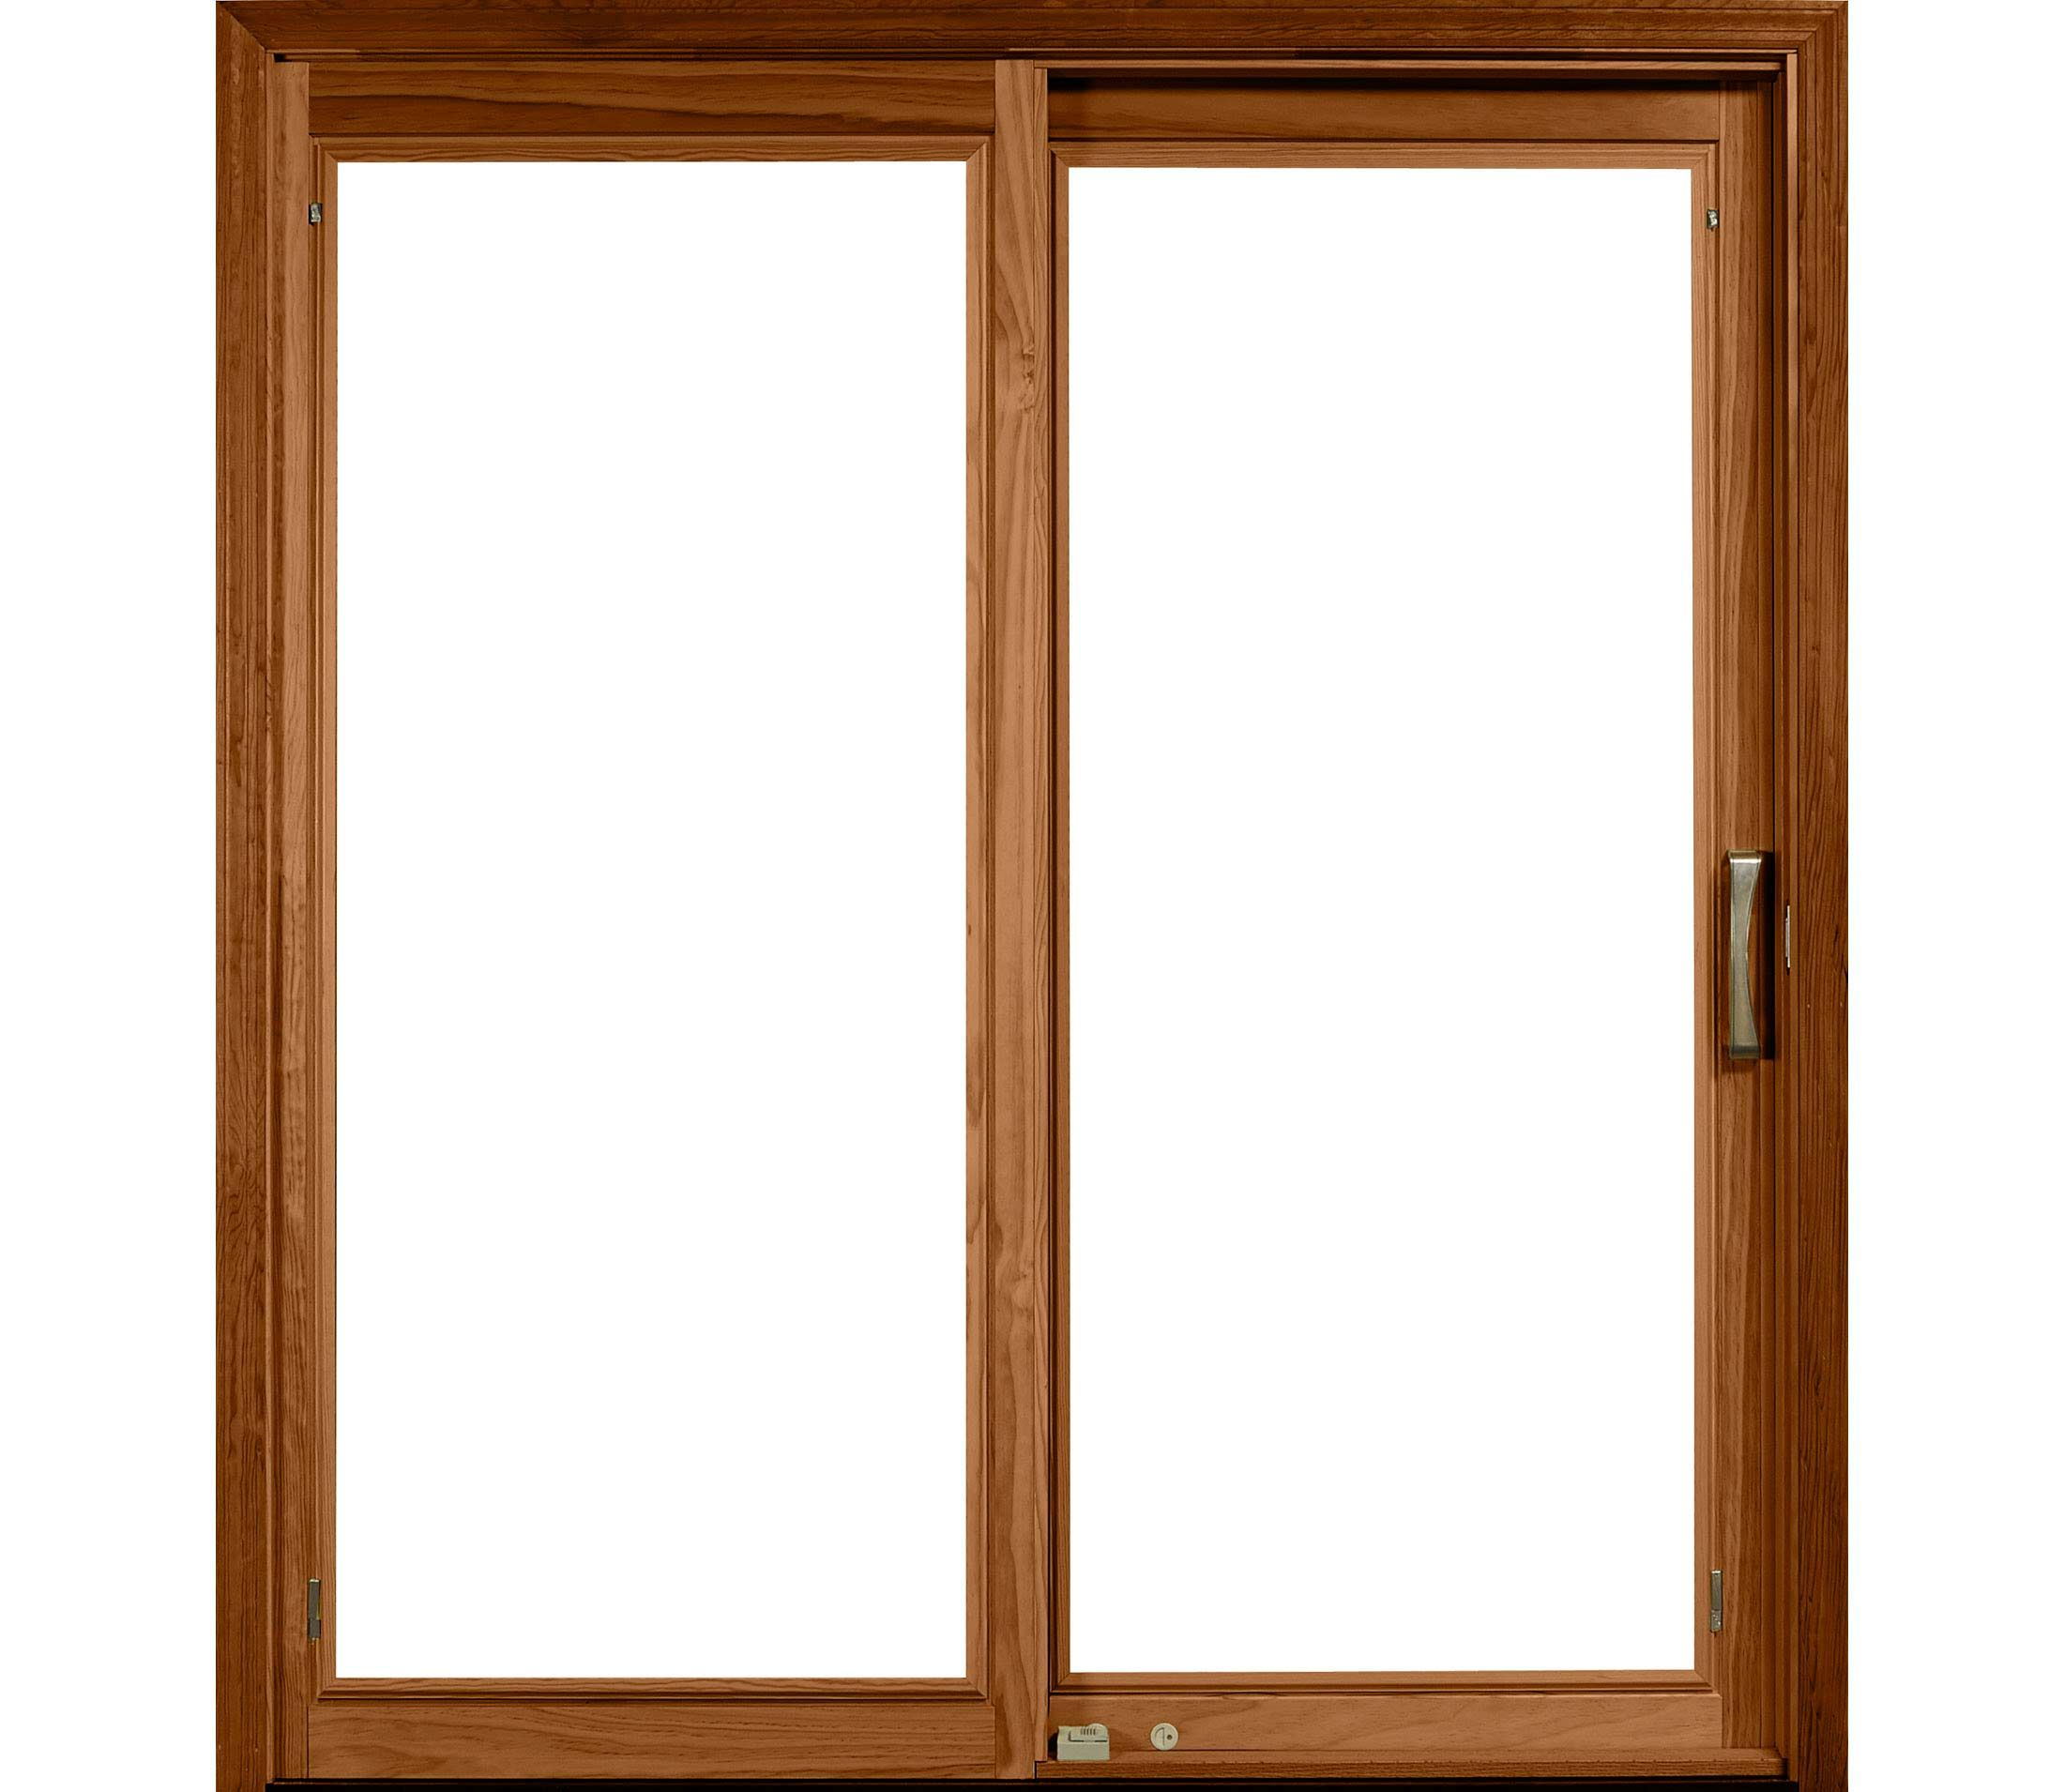 Comely Mini Blinds Pella Sliding Doors Lowes Pella Series Sliding Doors Jonathan Steele Pella Sliding Door Zef Jam Pella Sliding Doors